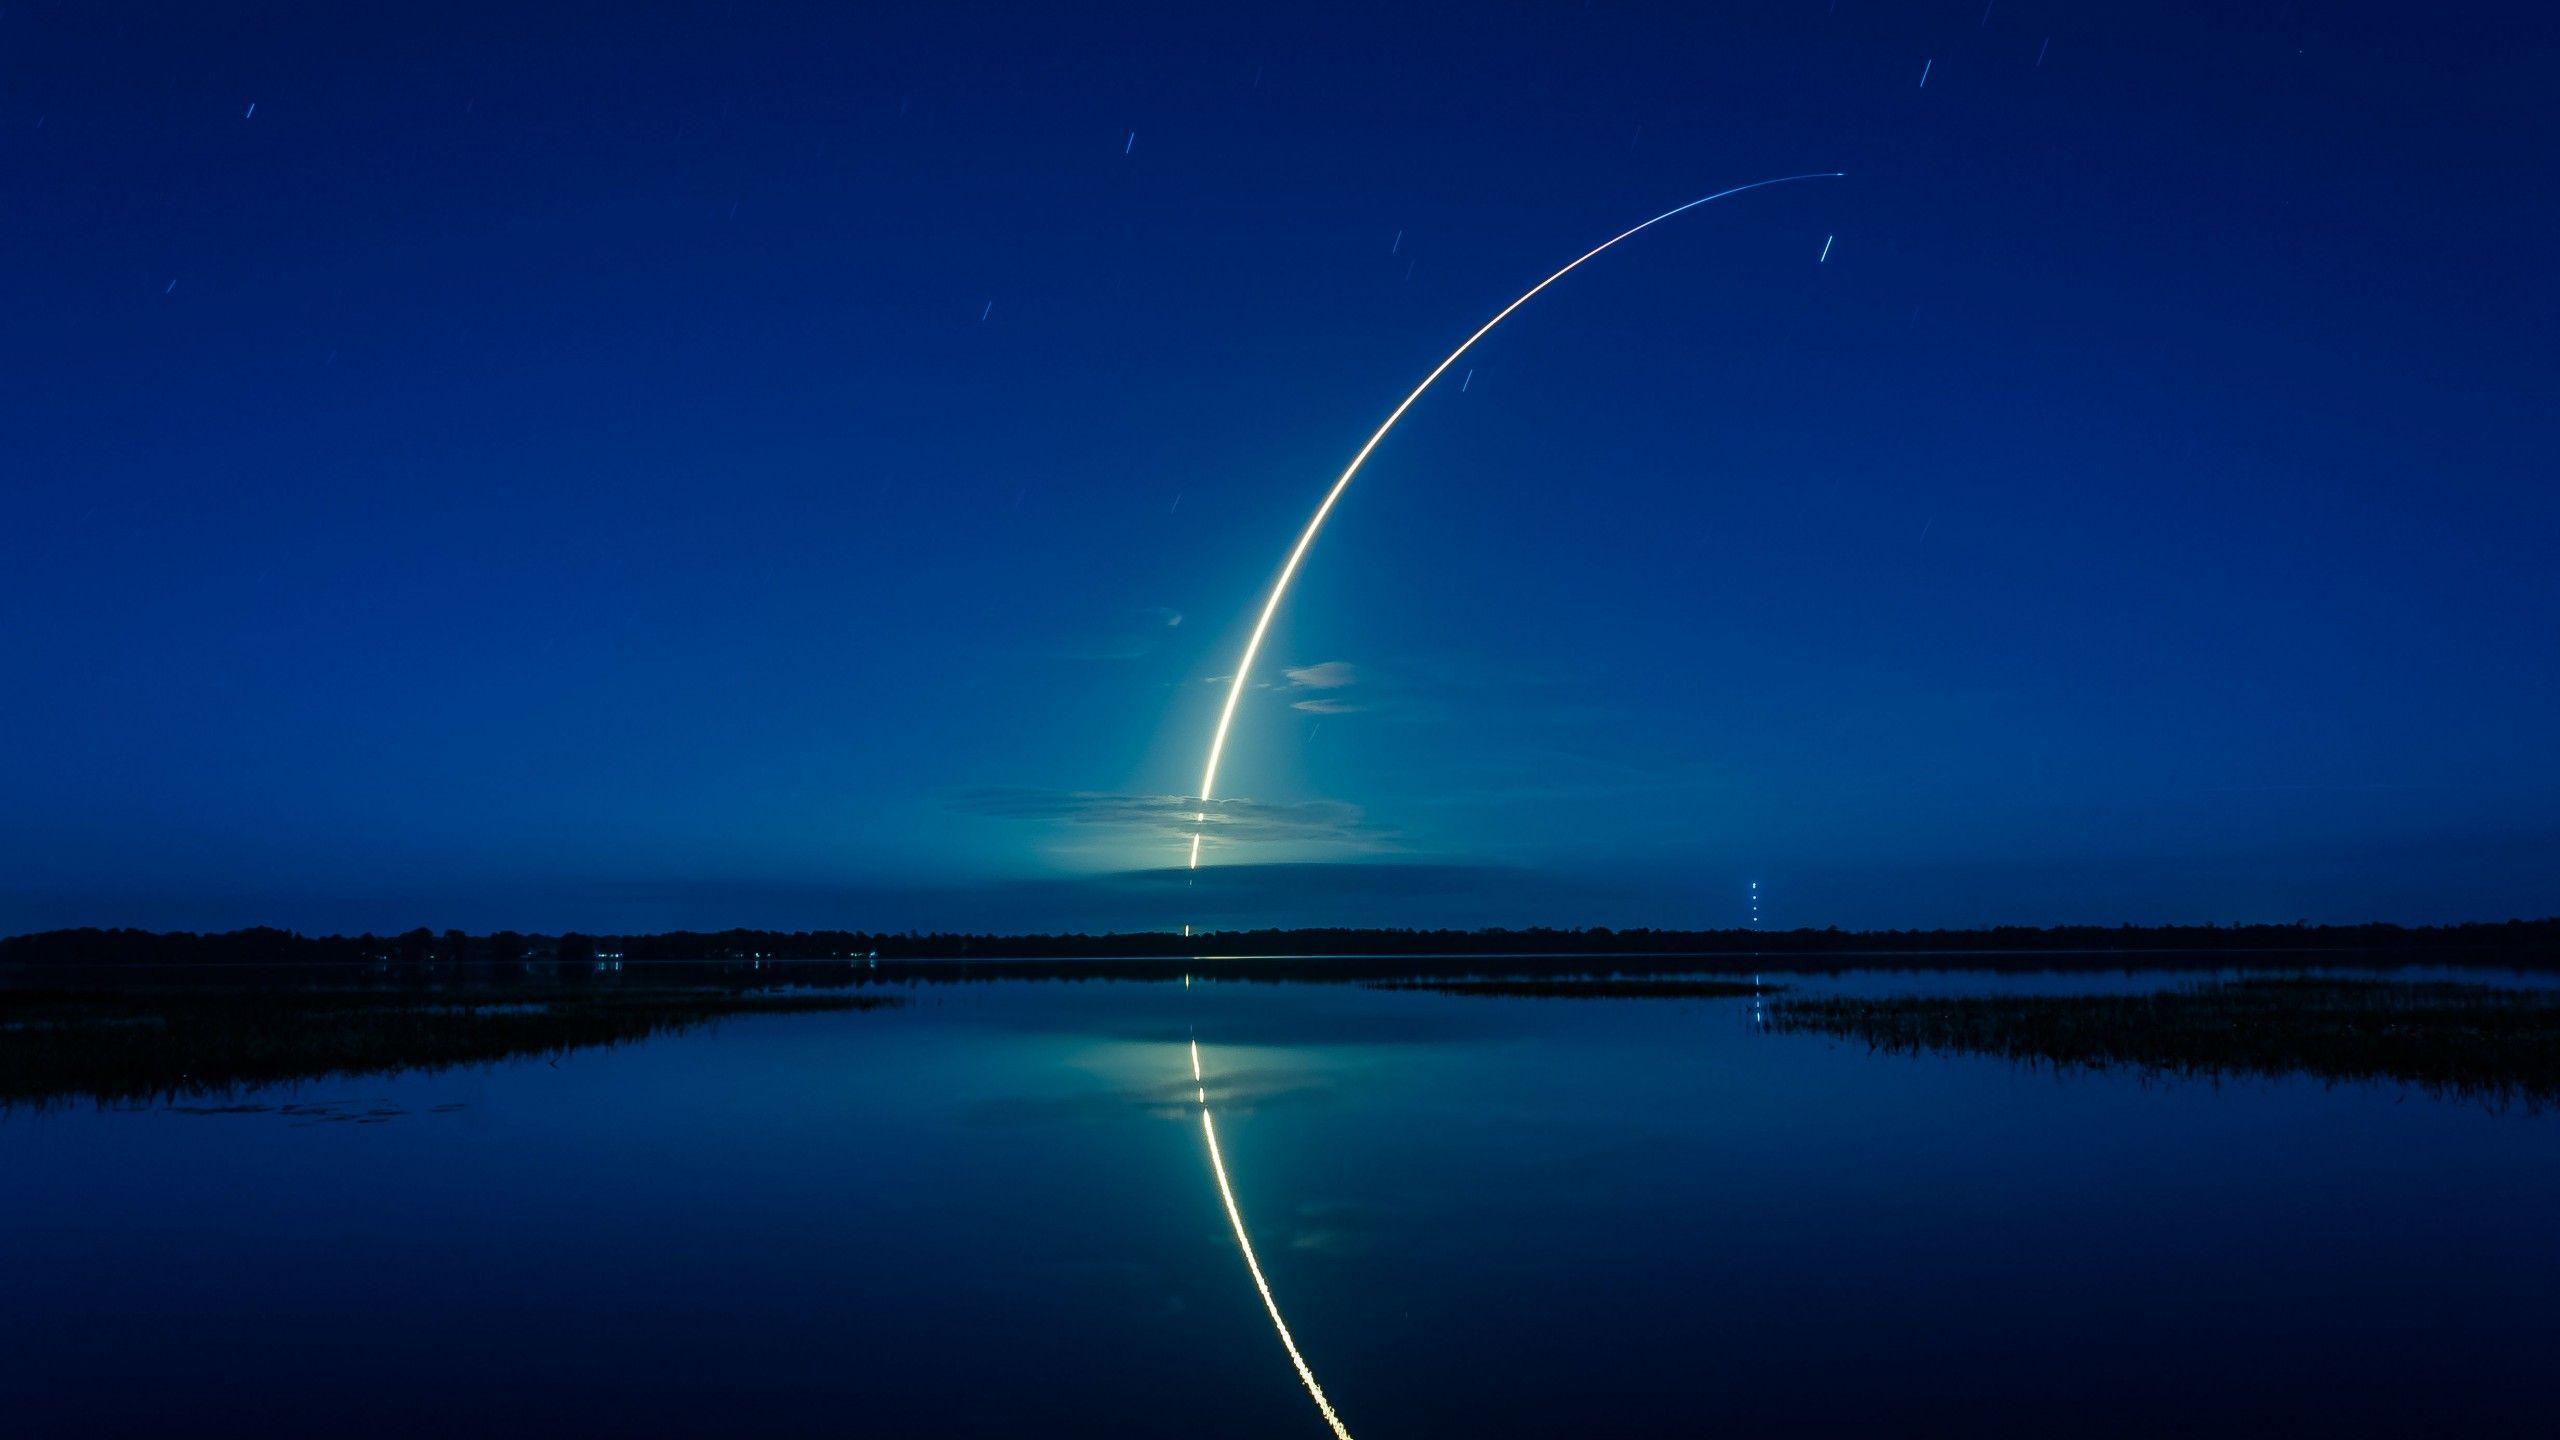 space rocket wallpaper,sky,blue,night,light,atmosphere